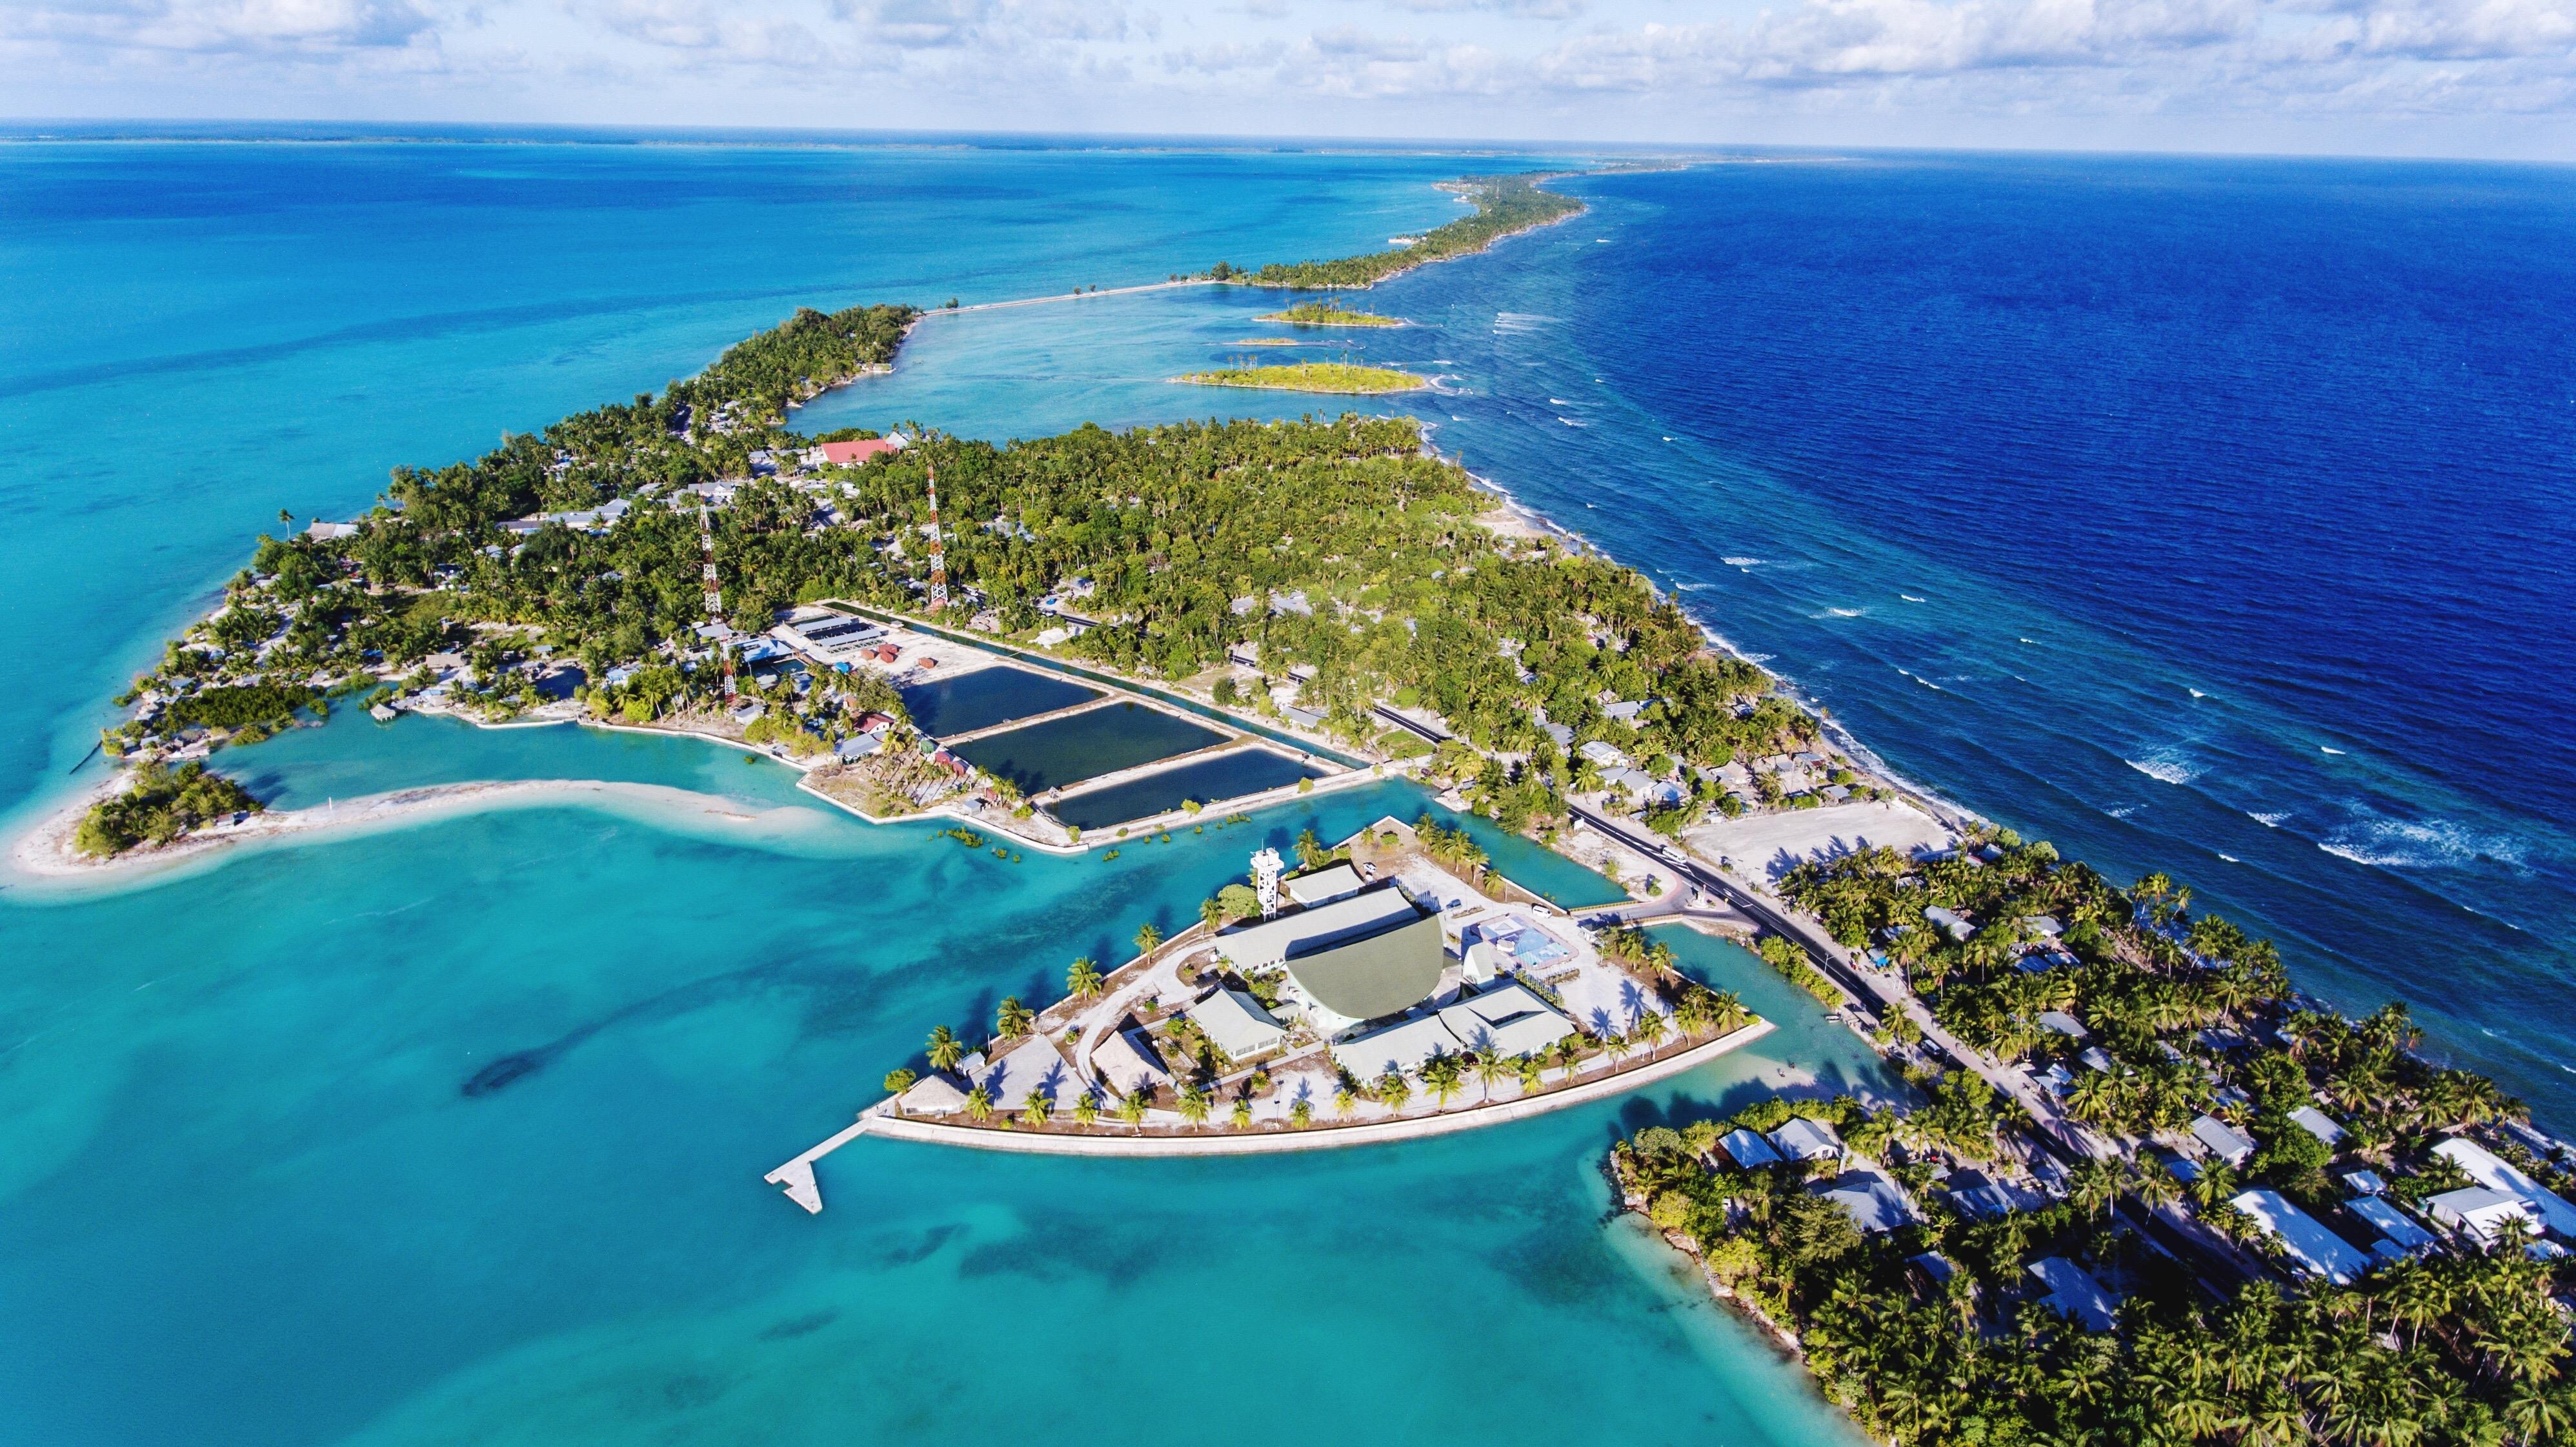 El primer país en desaparecer por crisis climática: Kiribati